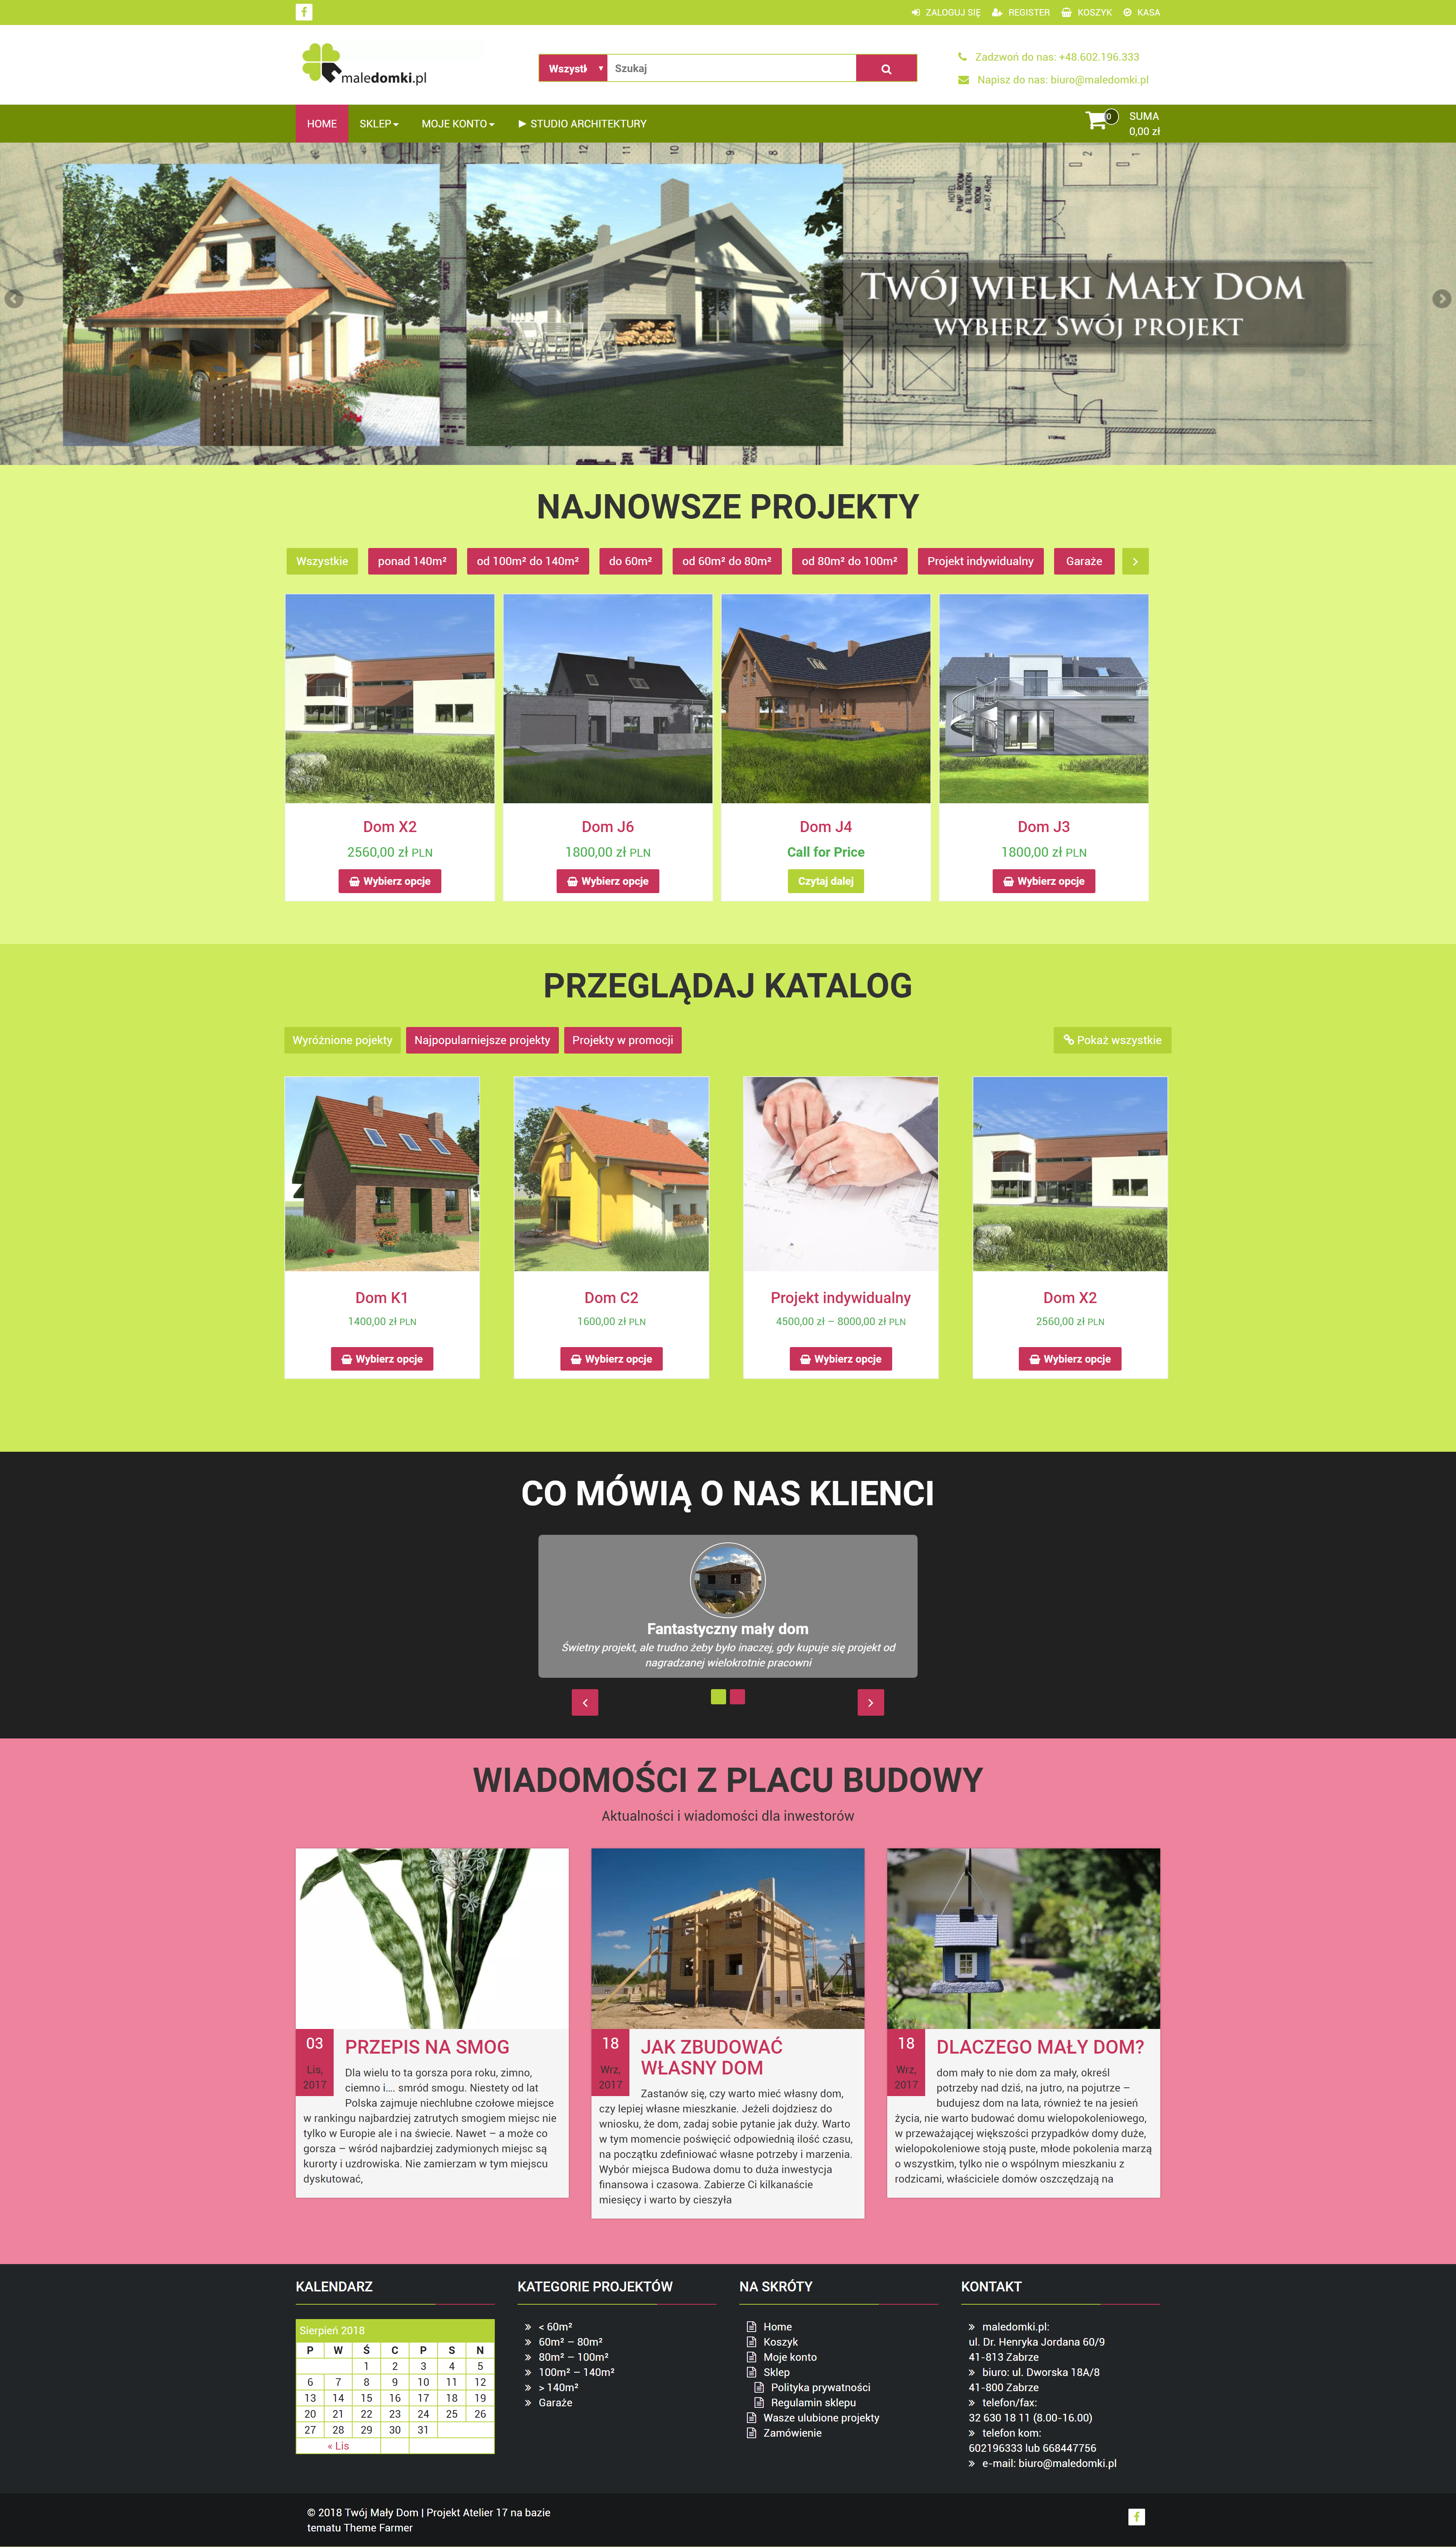 Website for Maledomki.pl (including on-line store)